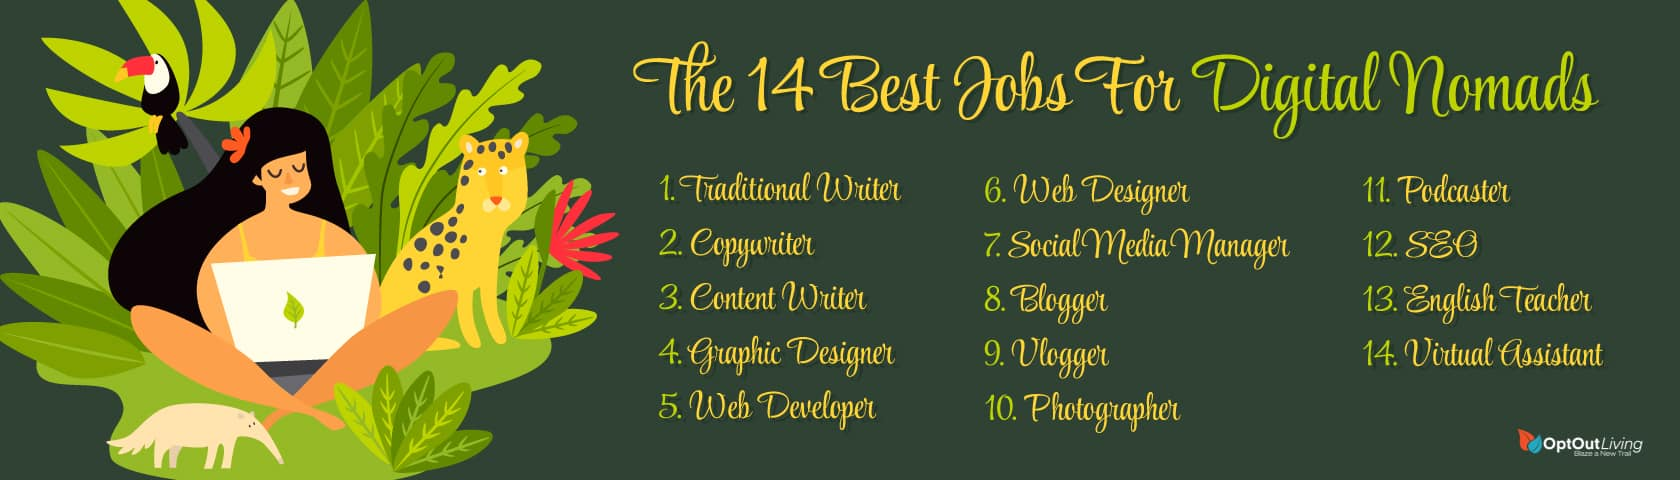 Digital Nomad Jobs infographic